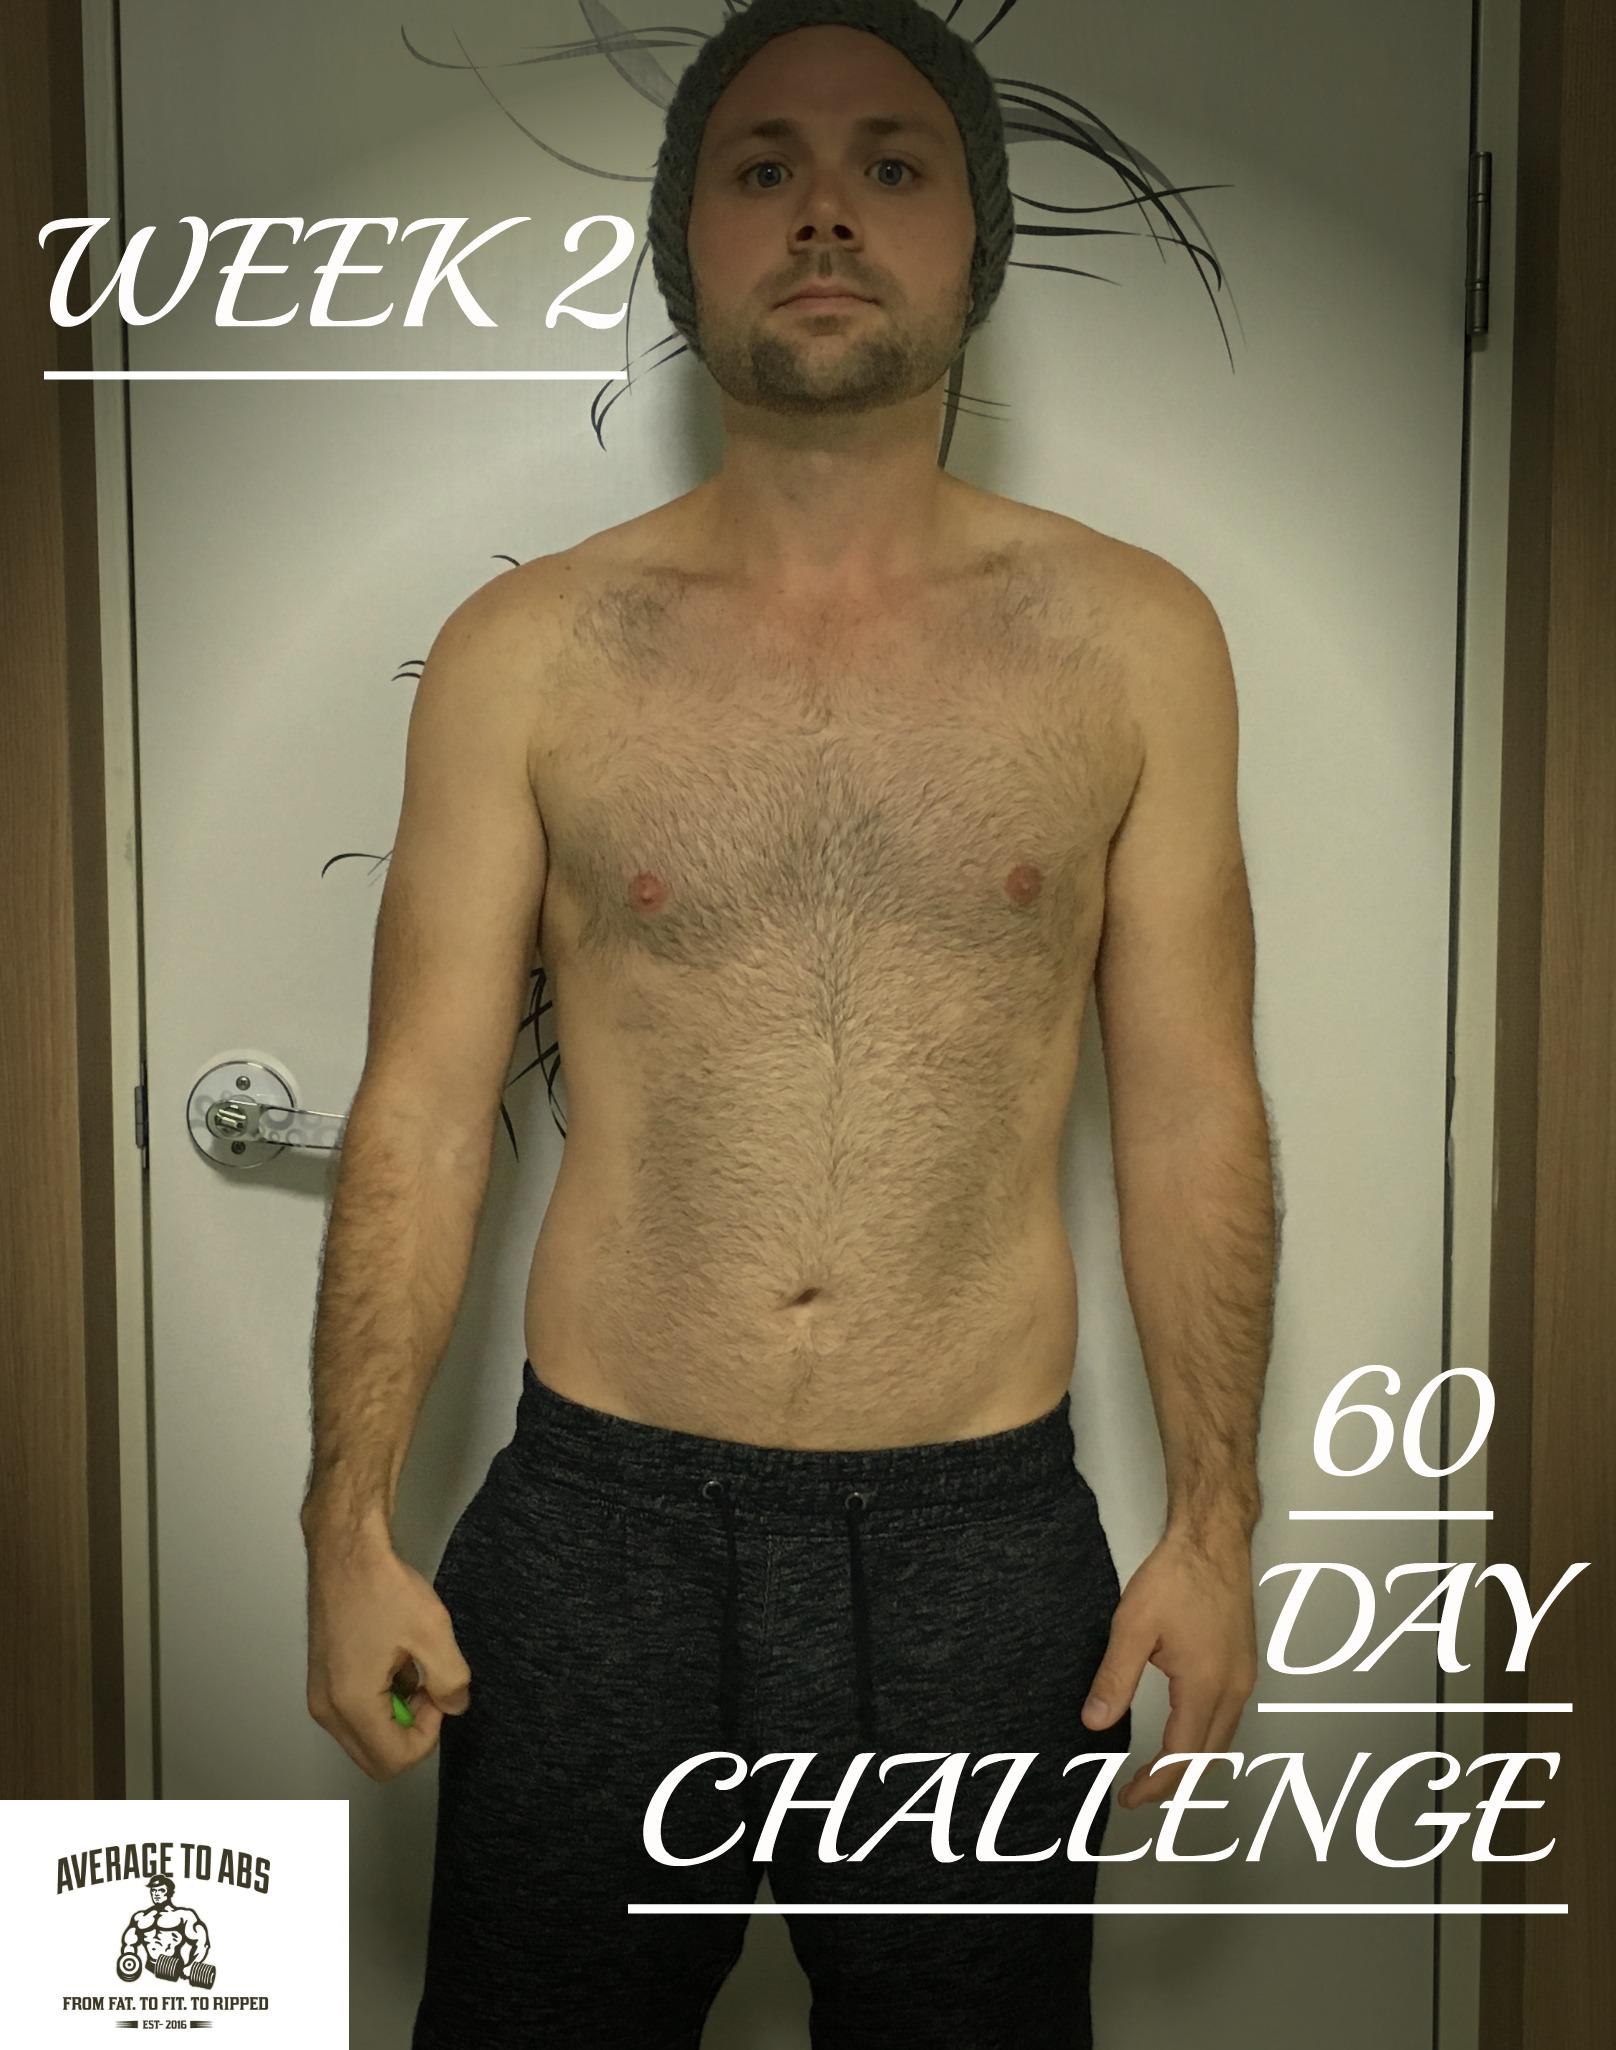 60 Day Challenge Week 2